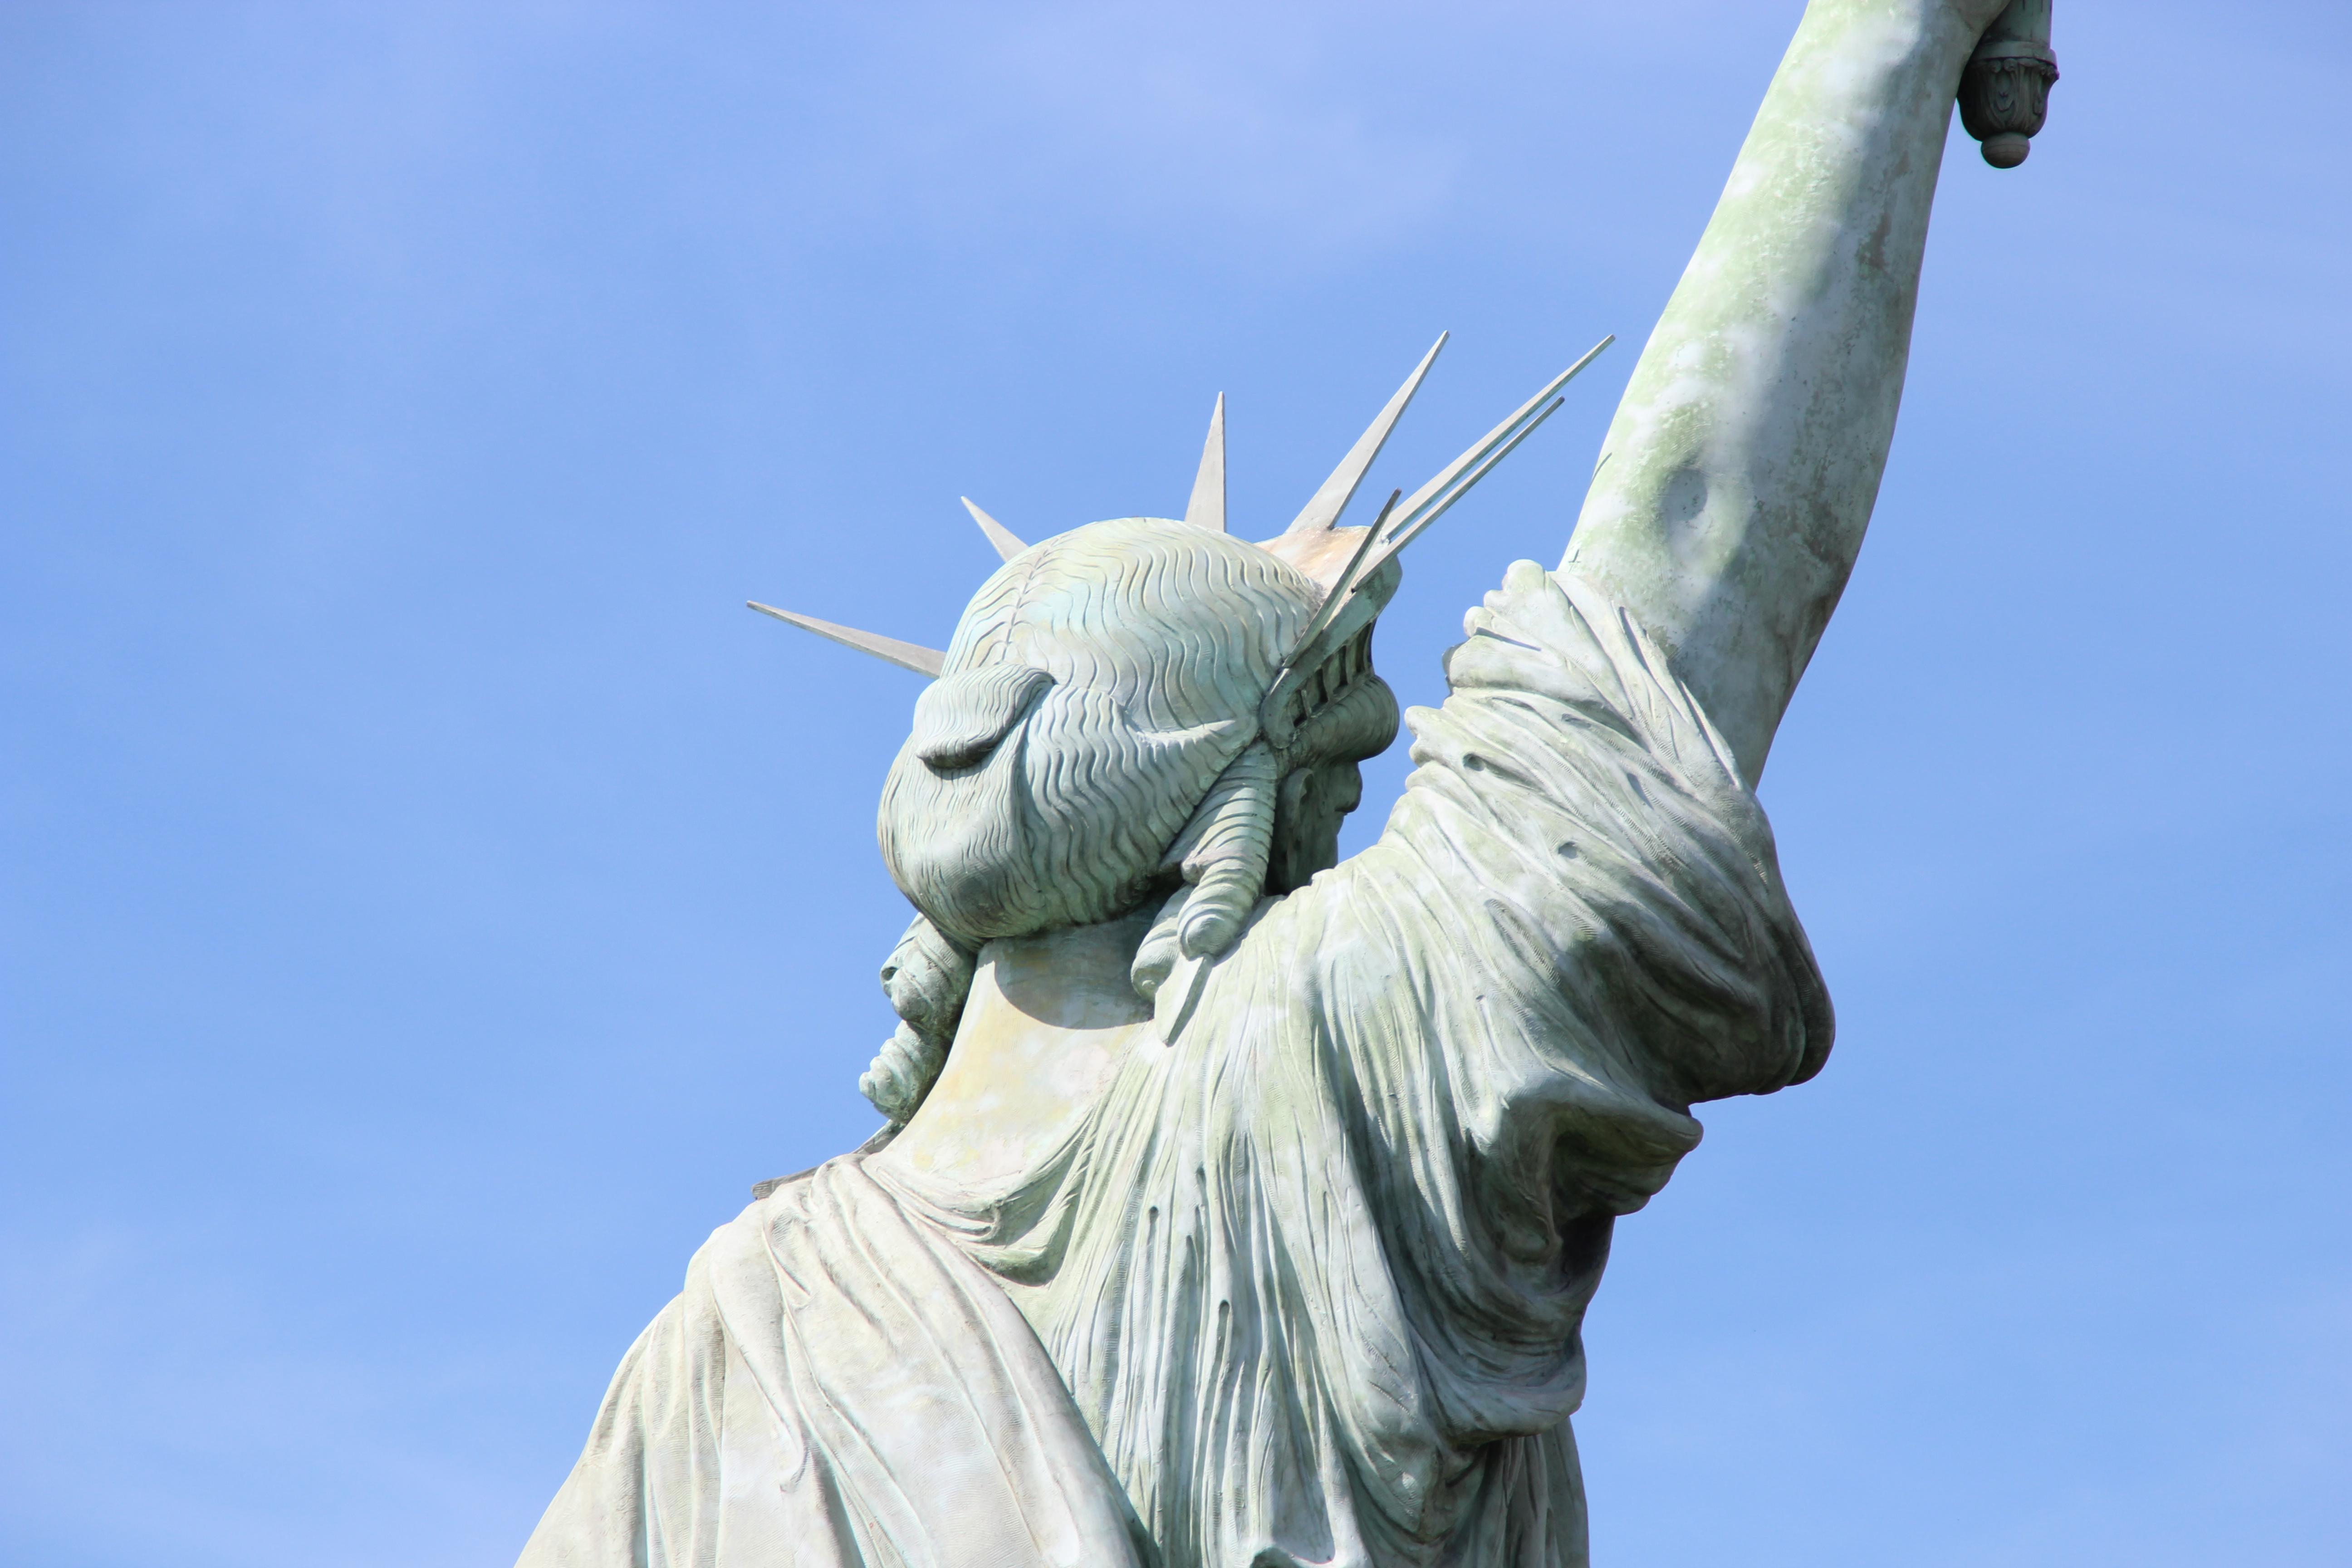 Statue of liberty history summary